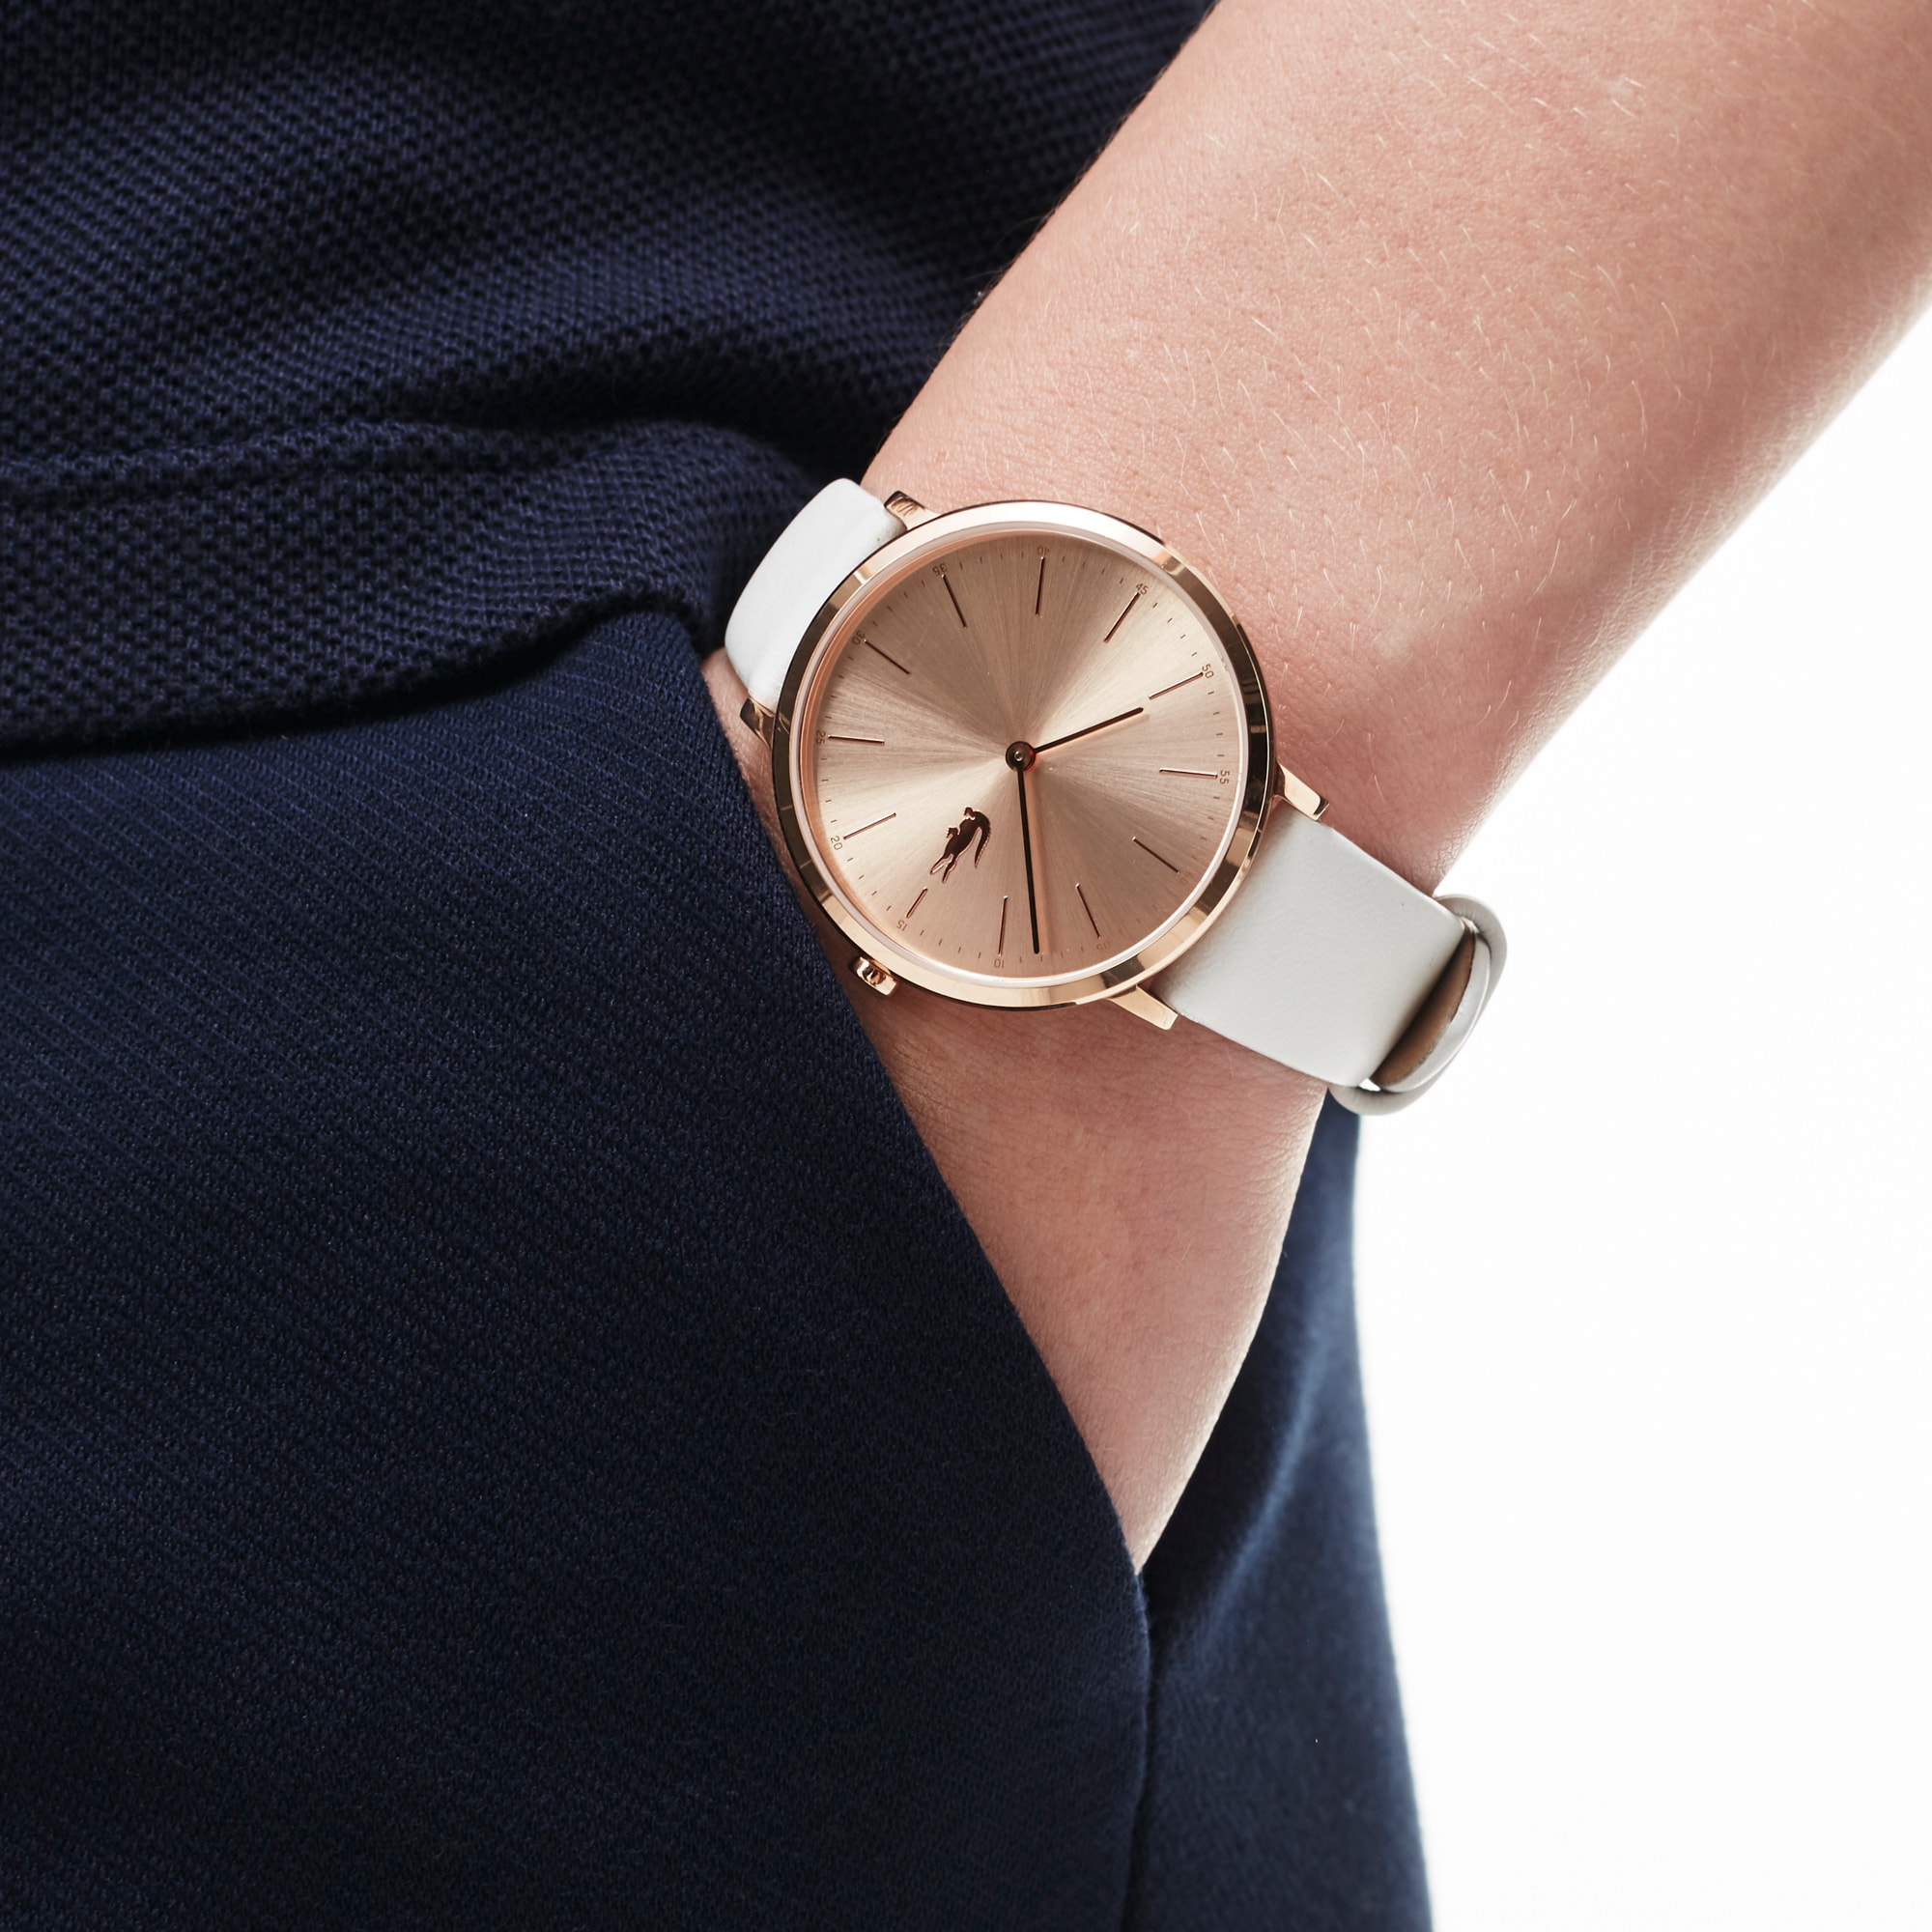 Montre Moon Ultrafine Femme avec Bracelet Blanc en Cuir